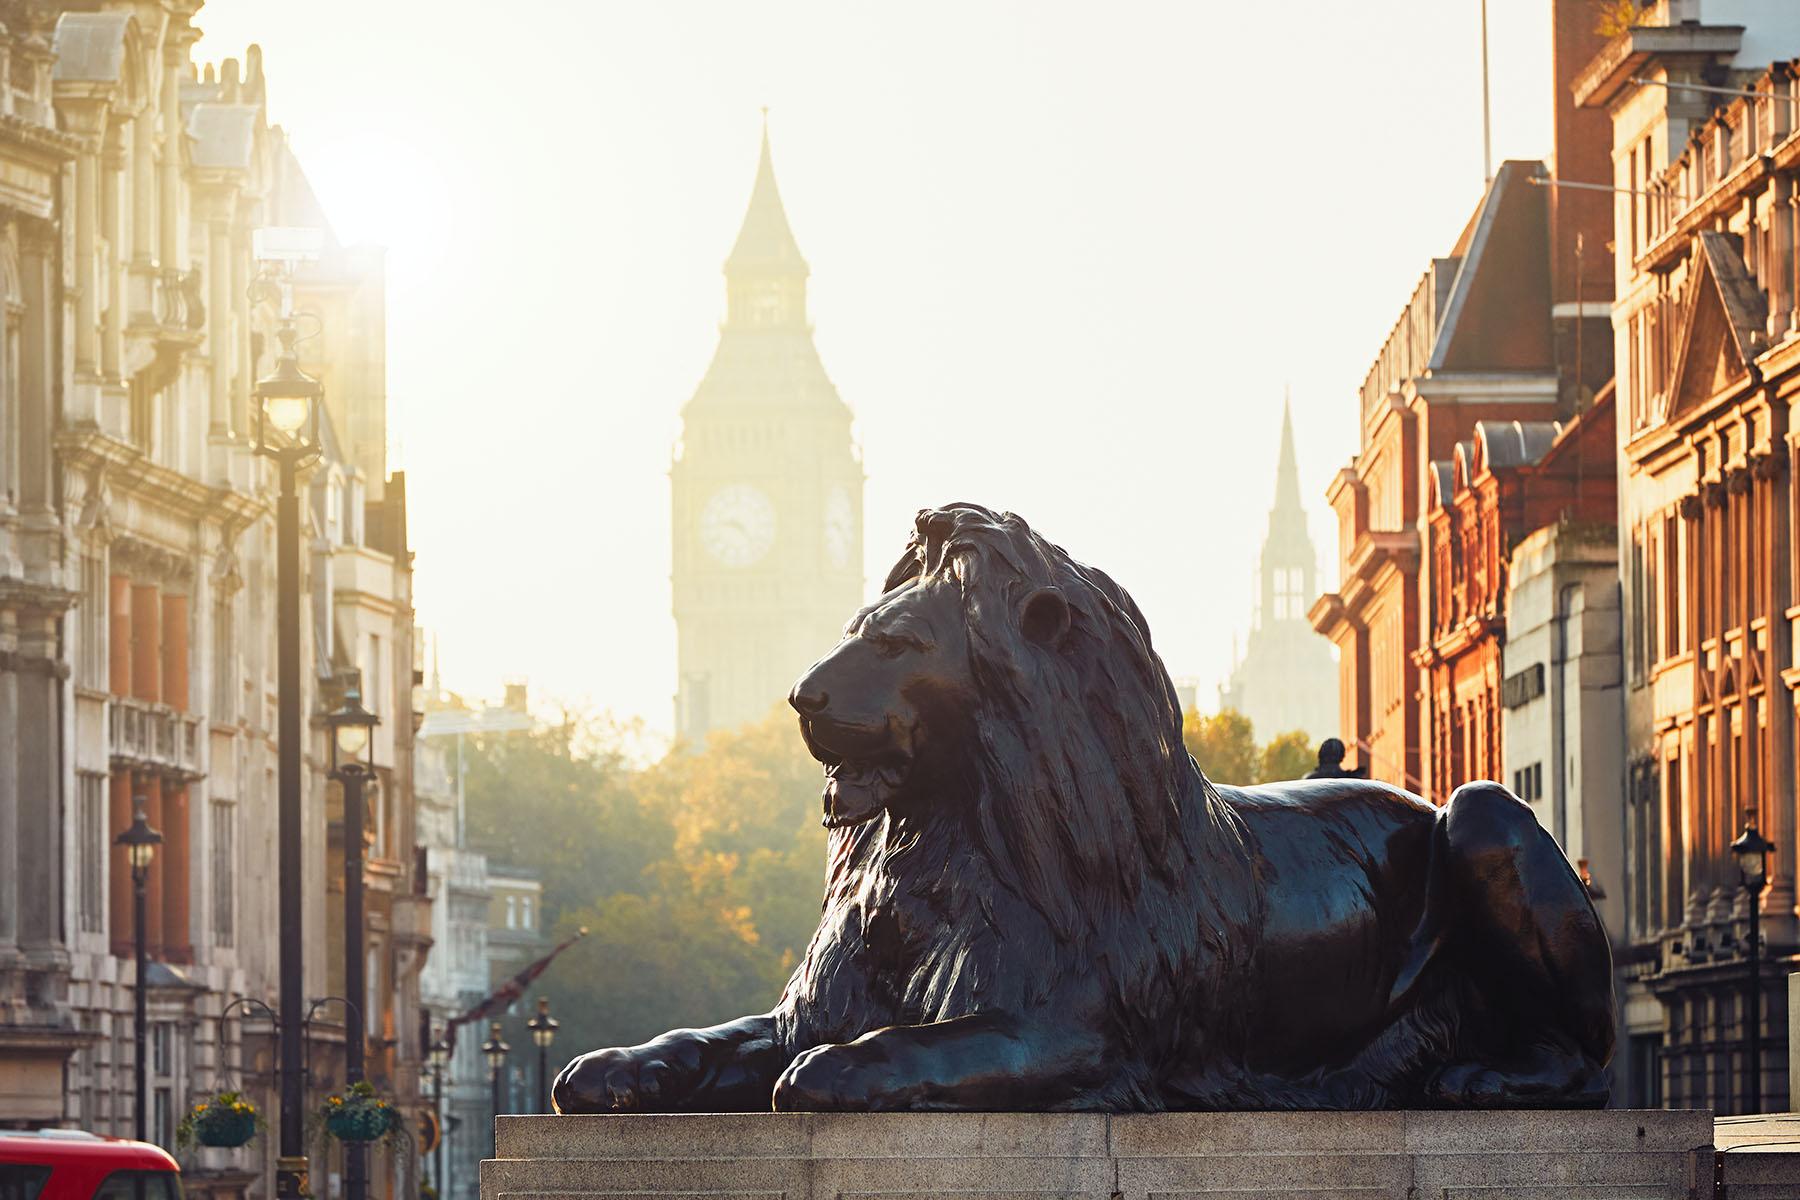 london-street-at-the-sunrise-P7MK62T